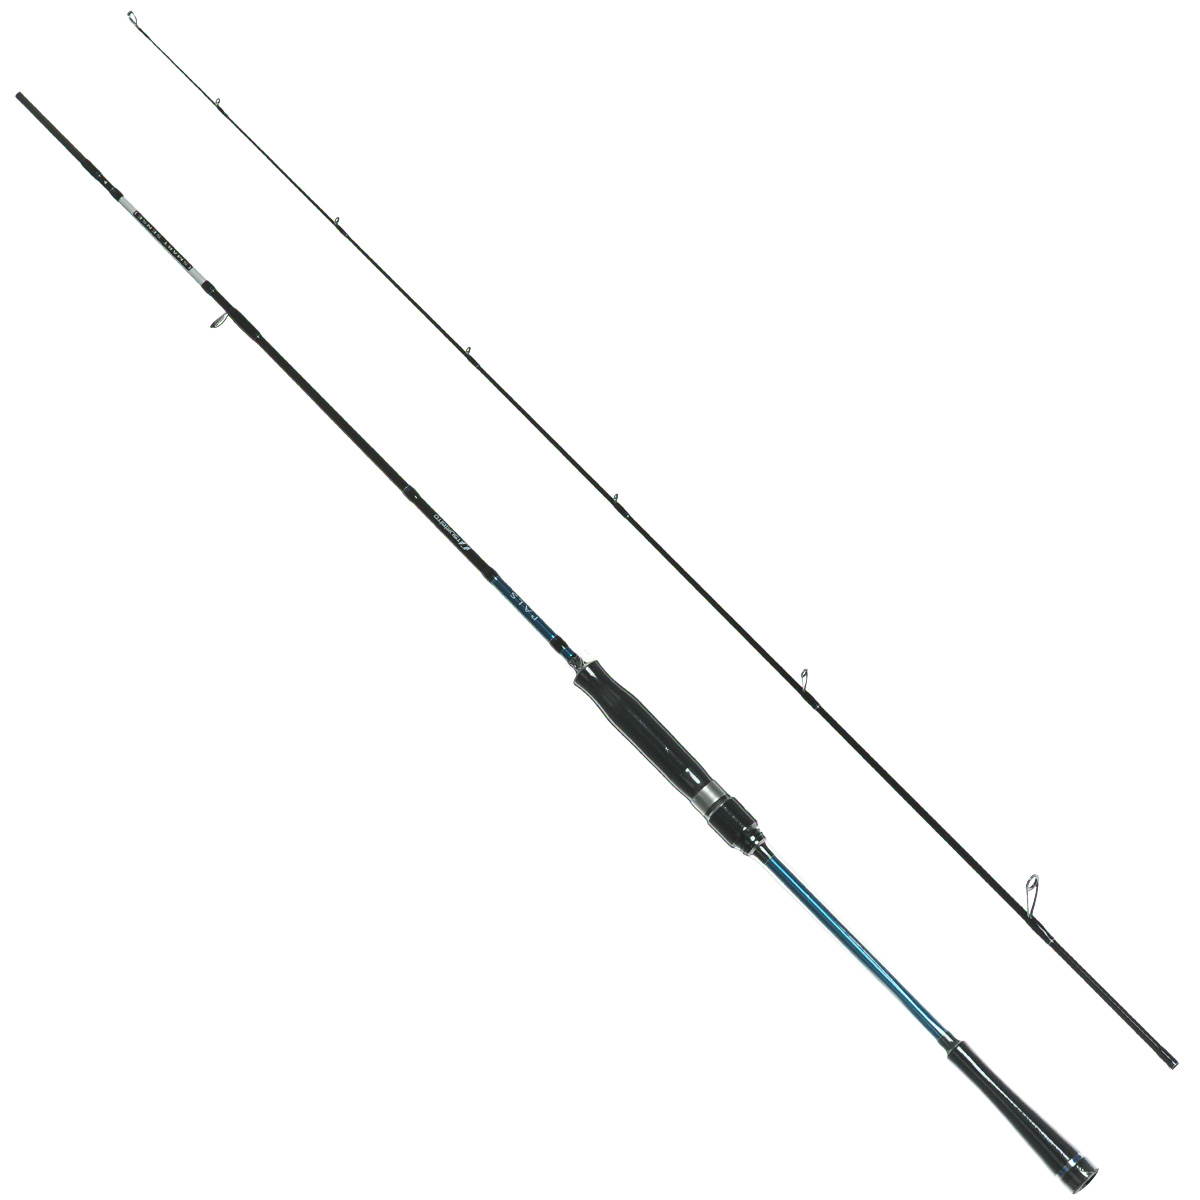 Удилище спиннинговое Tsuribito-Jackson Pals, 1,91 м, 4-15 г